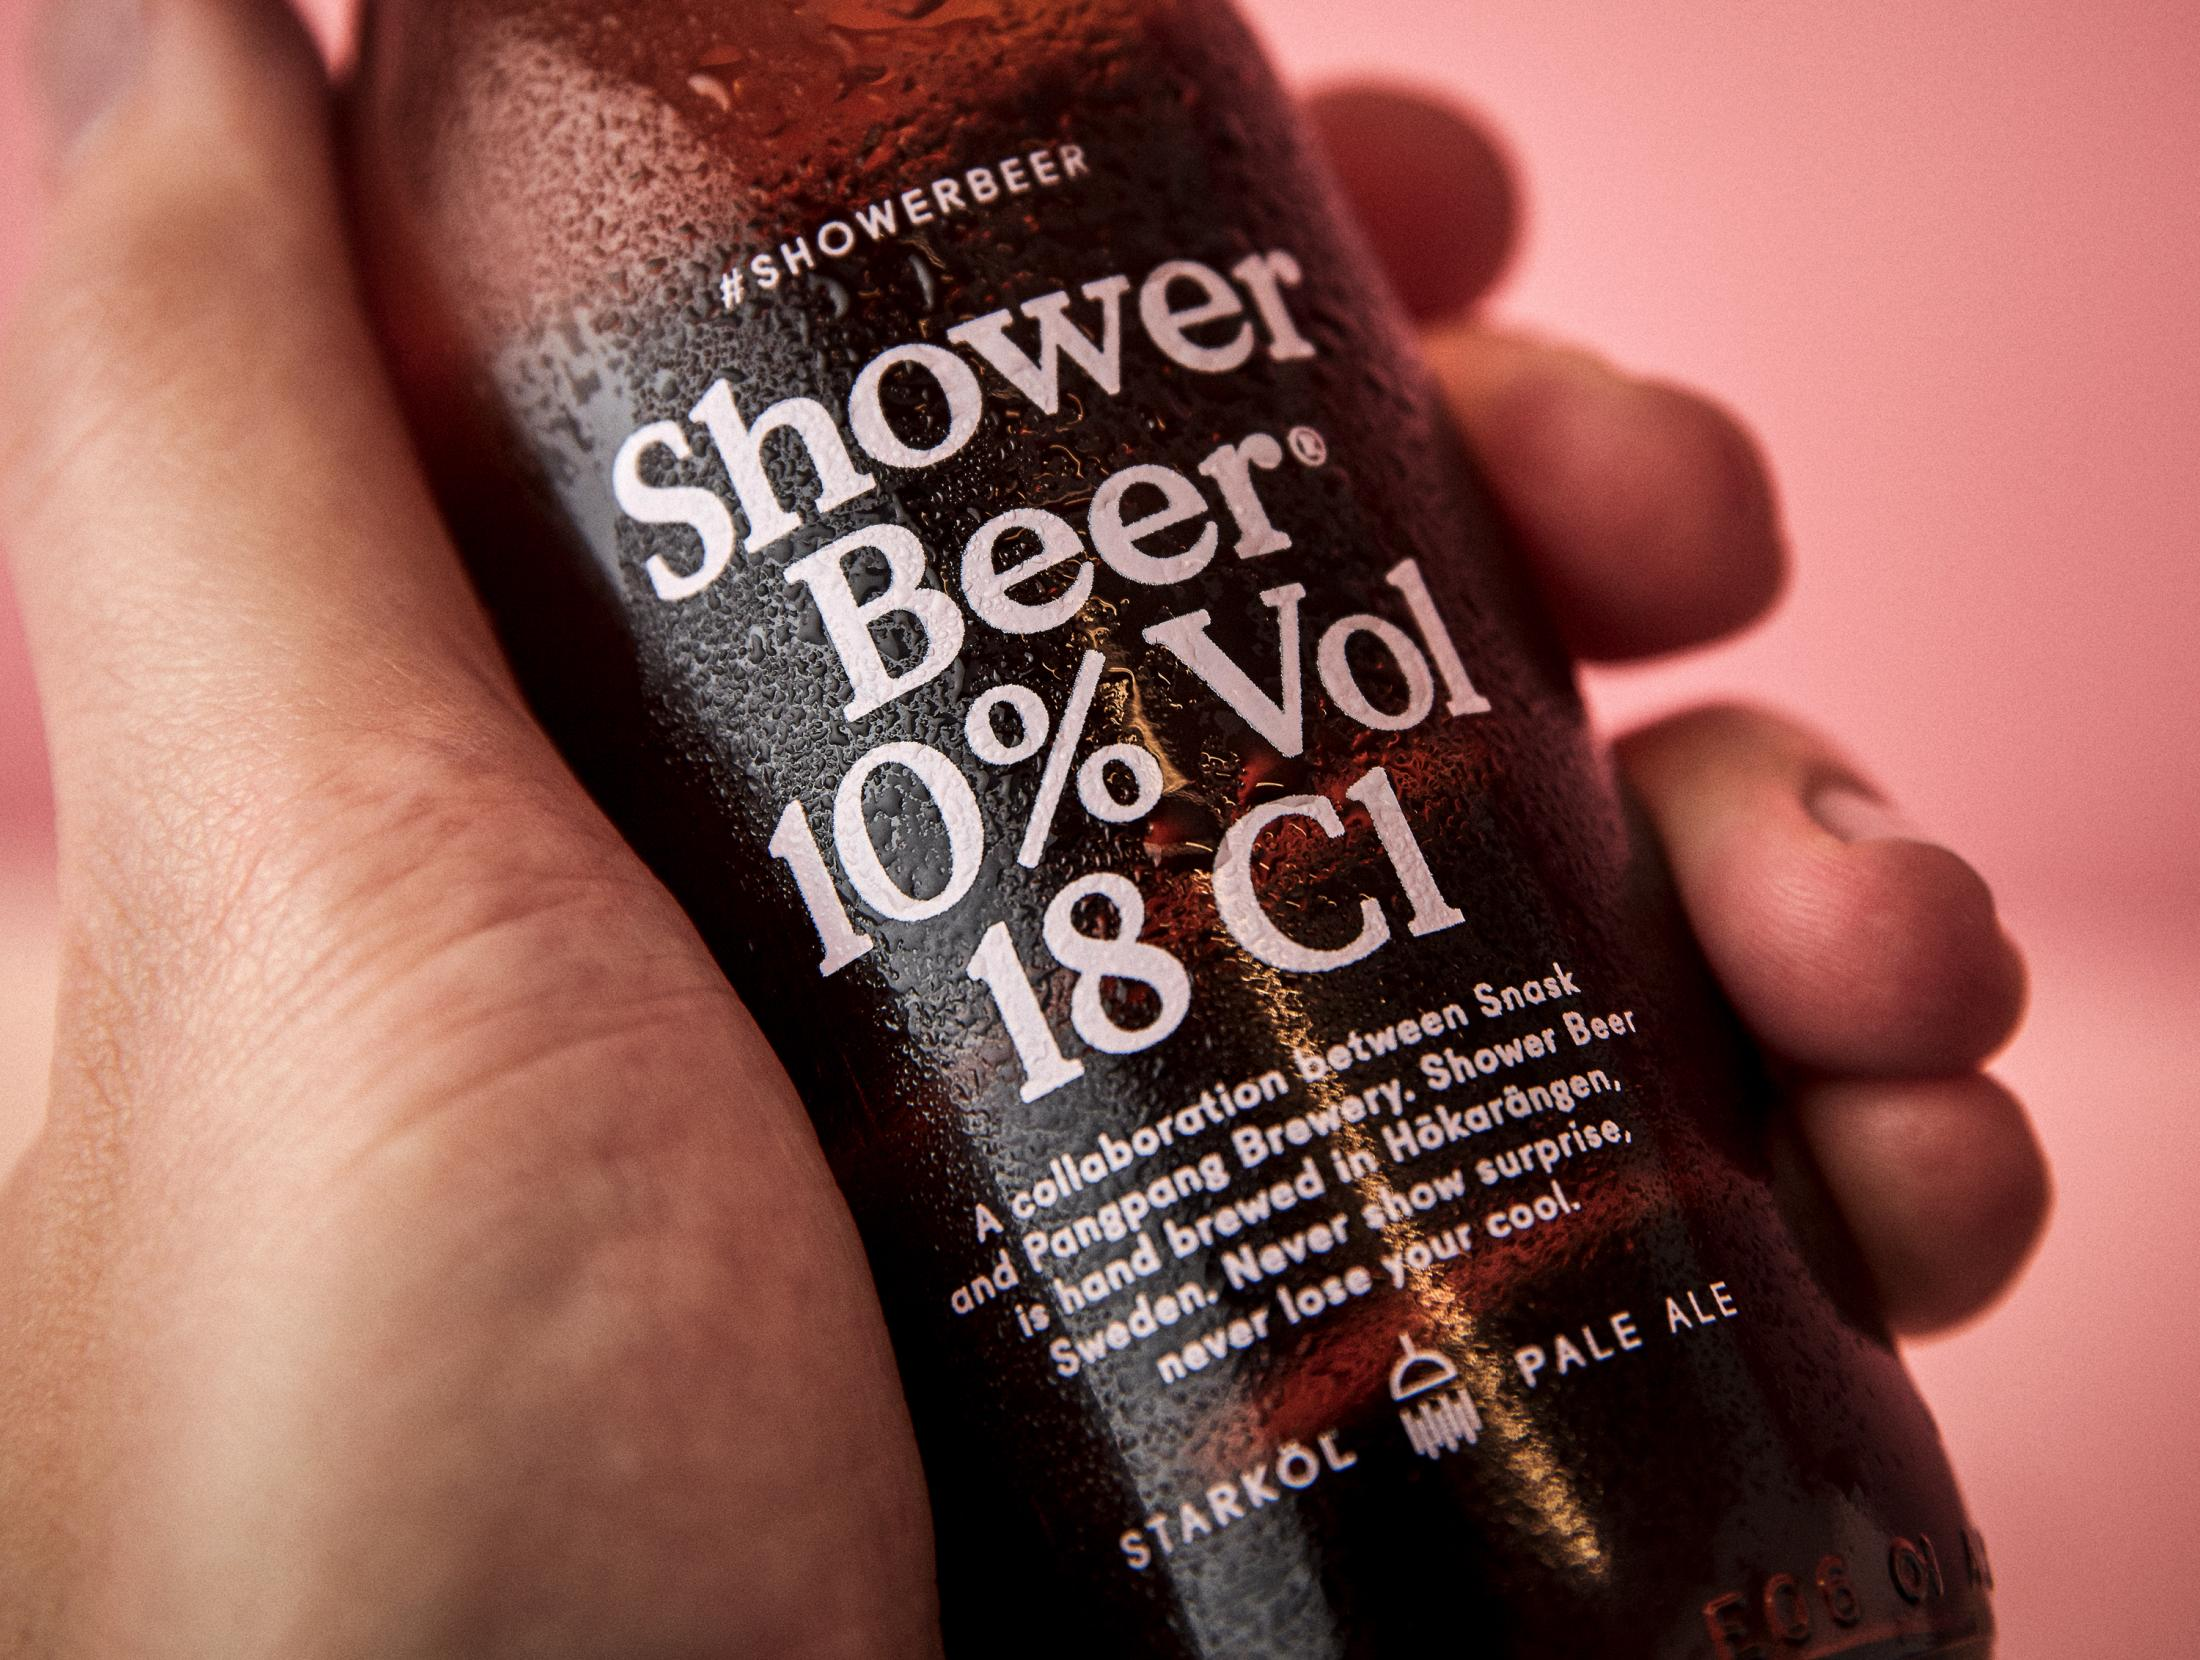 aotwshower-beer_07_hand-holding-bottle_close-up.jpg